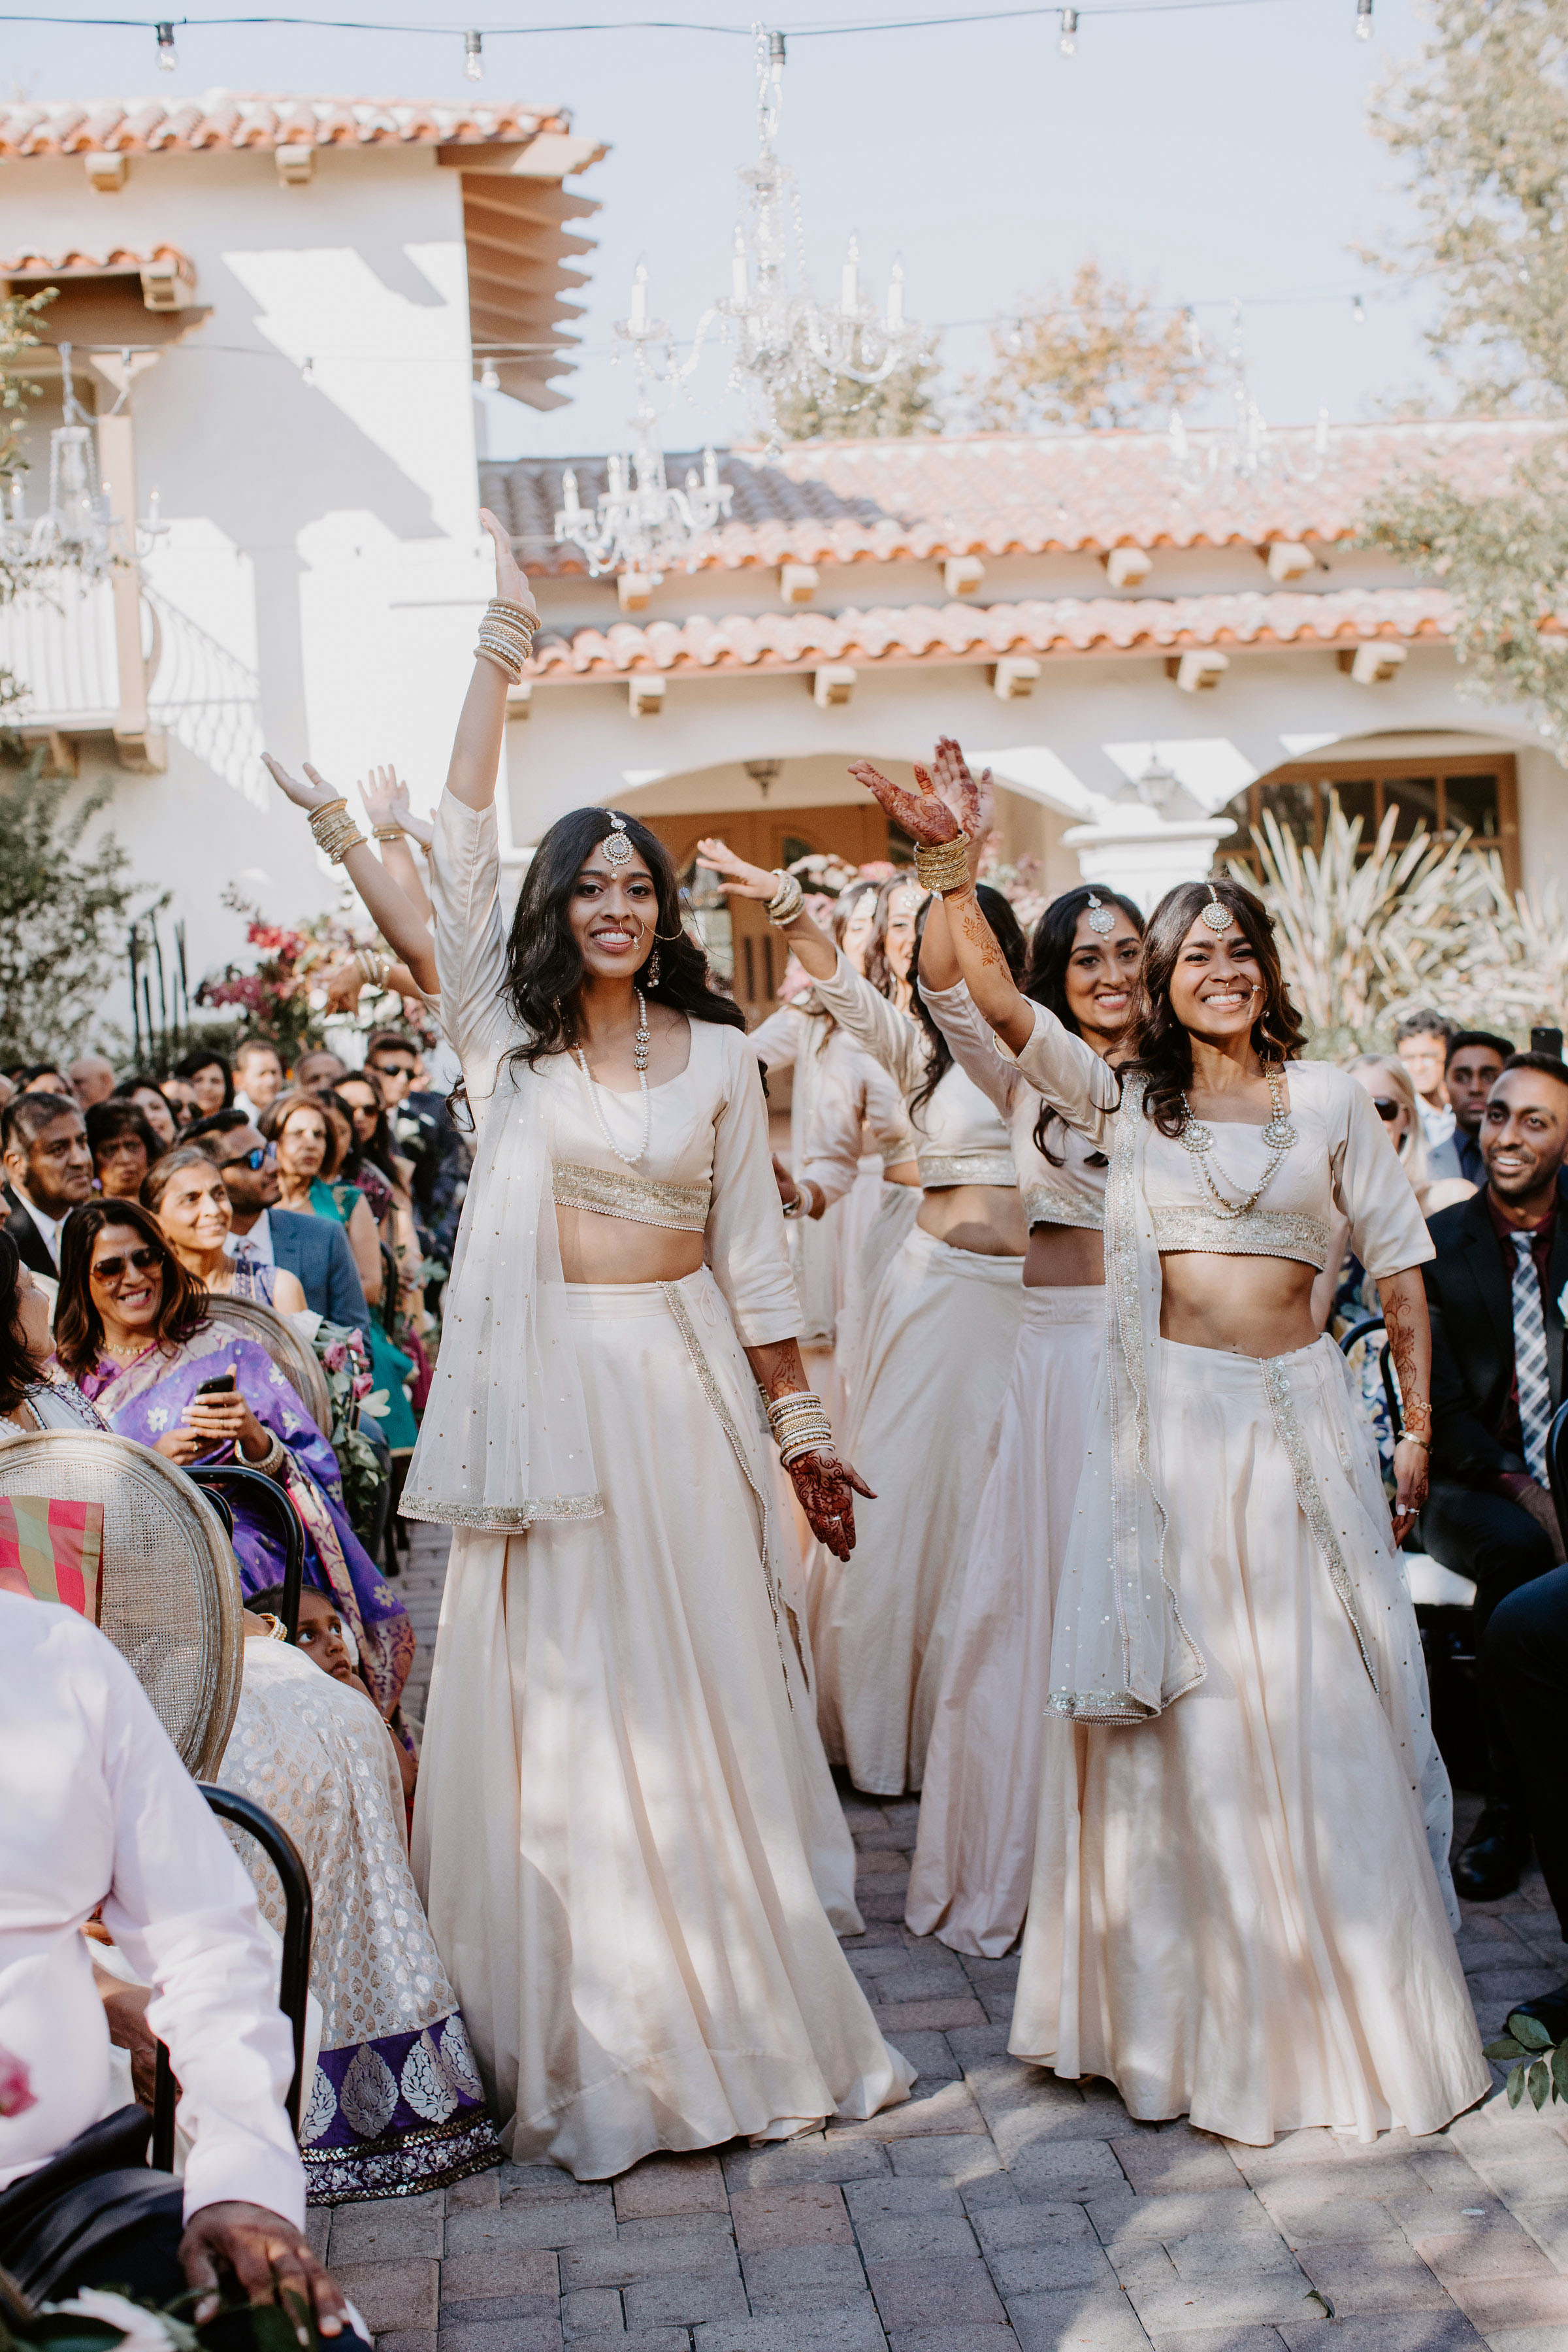 outdoor wedding bridesmaids dance indian cermony